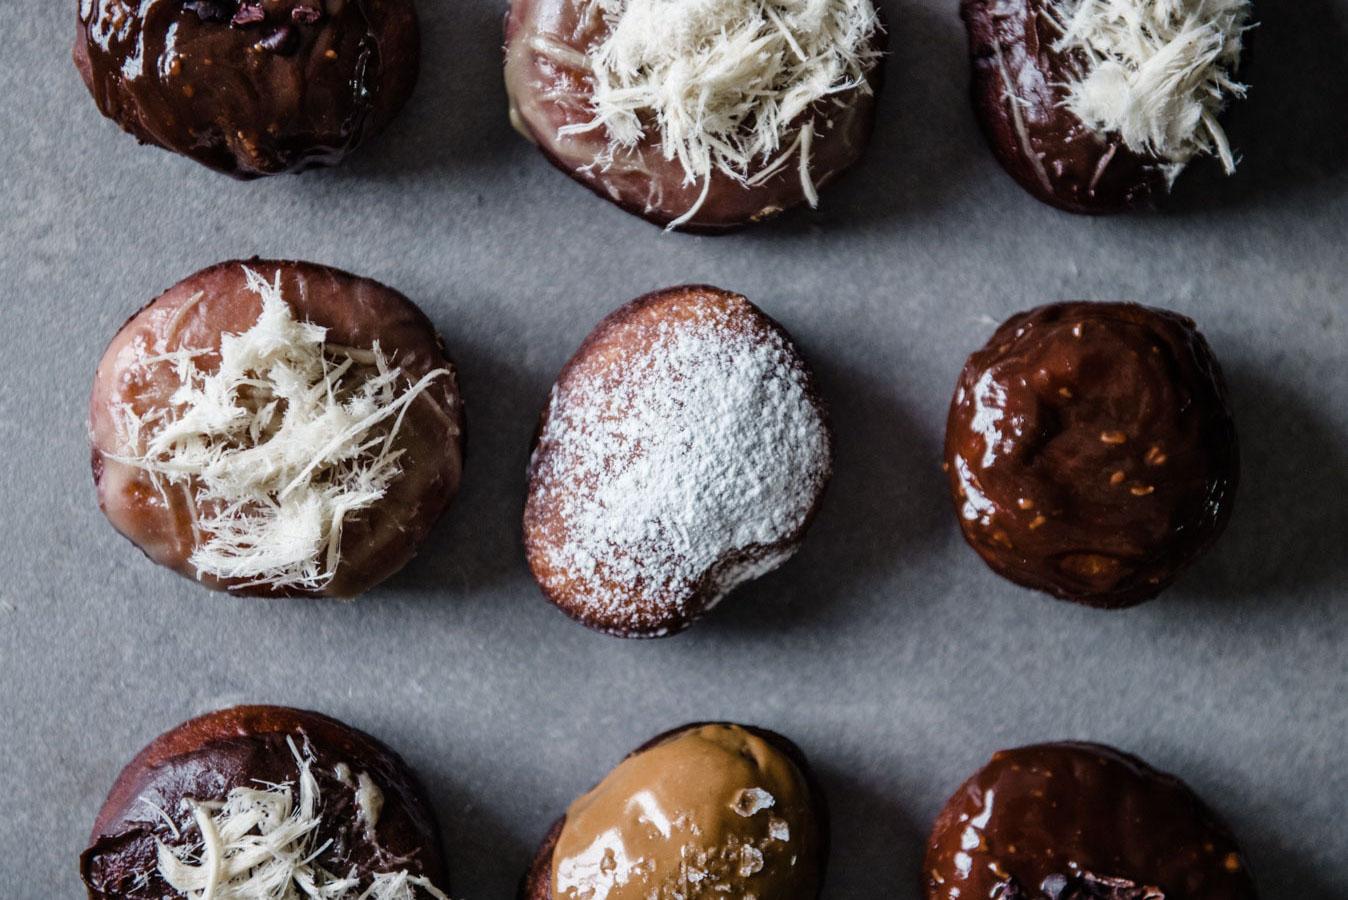 Vanilla Bean Sufganiyot With Halva, Cookie Butter, Praline and Chocolate Variations